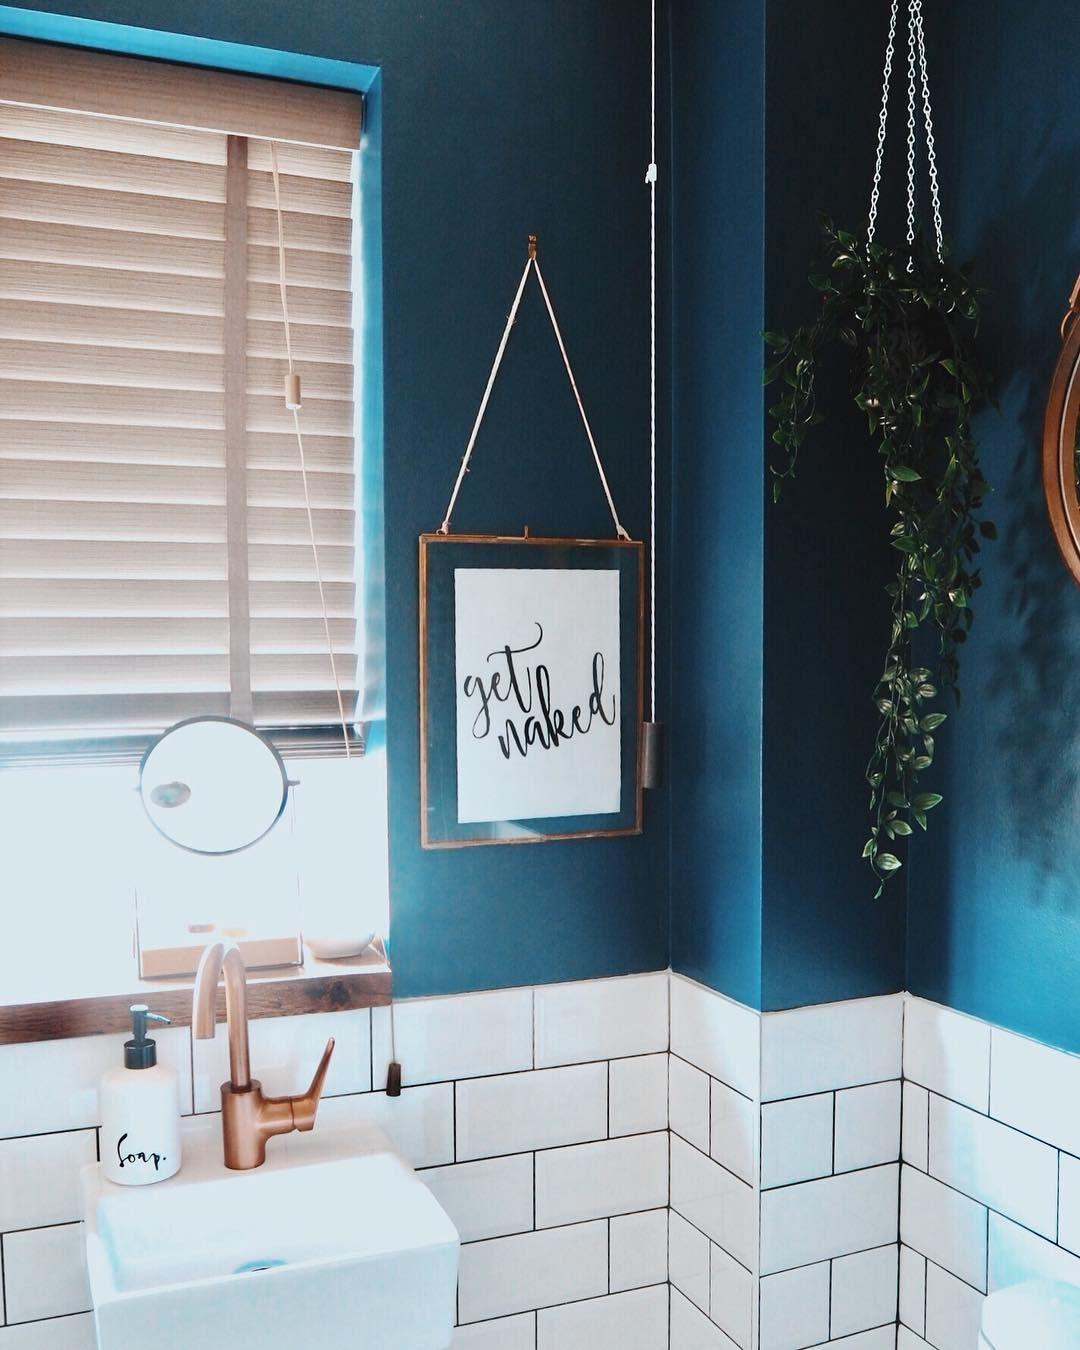 We Love This Stylish Instagram Bathroom Teal Bathroom Painting Bathroom Amazing Bathrooms